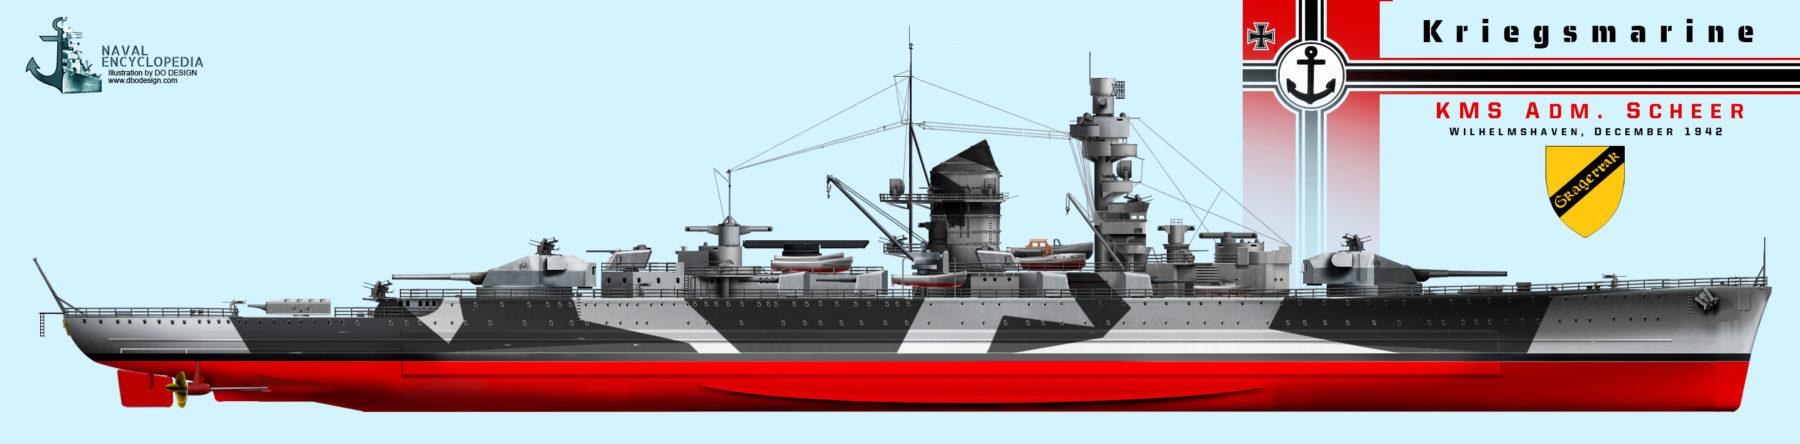 KMS Admiral Scheer, Wilelmshaven, December 1942, major modernization